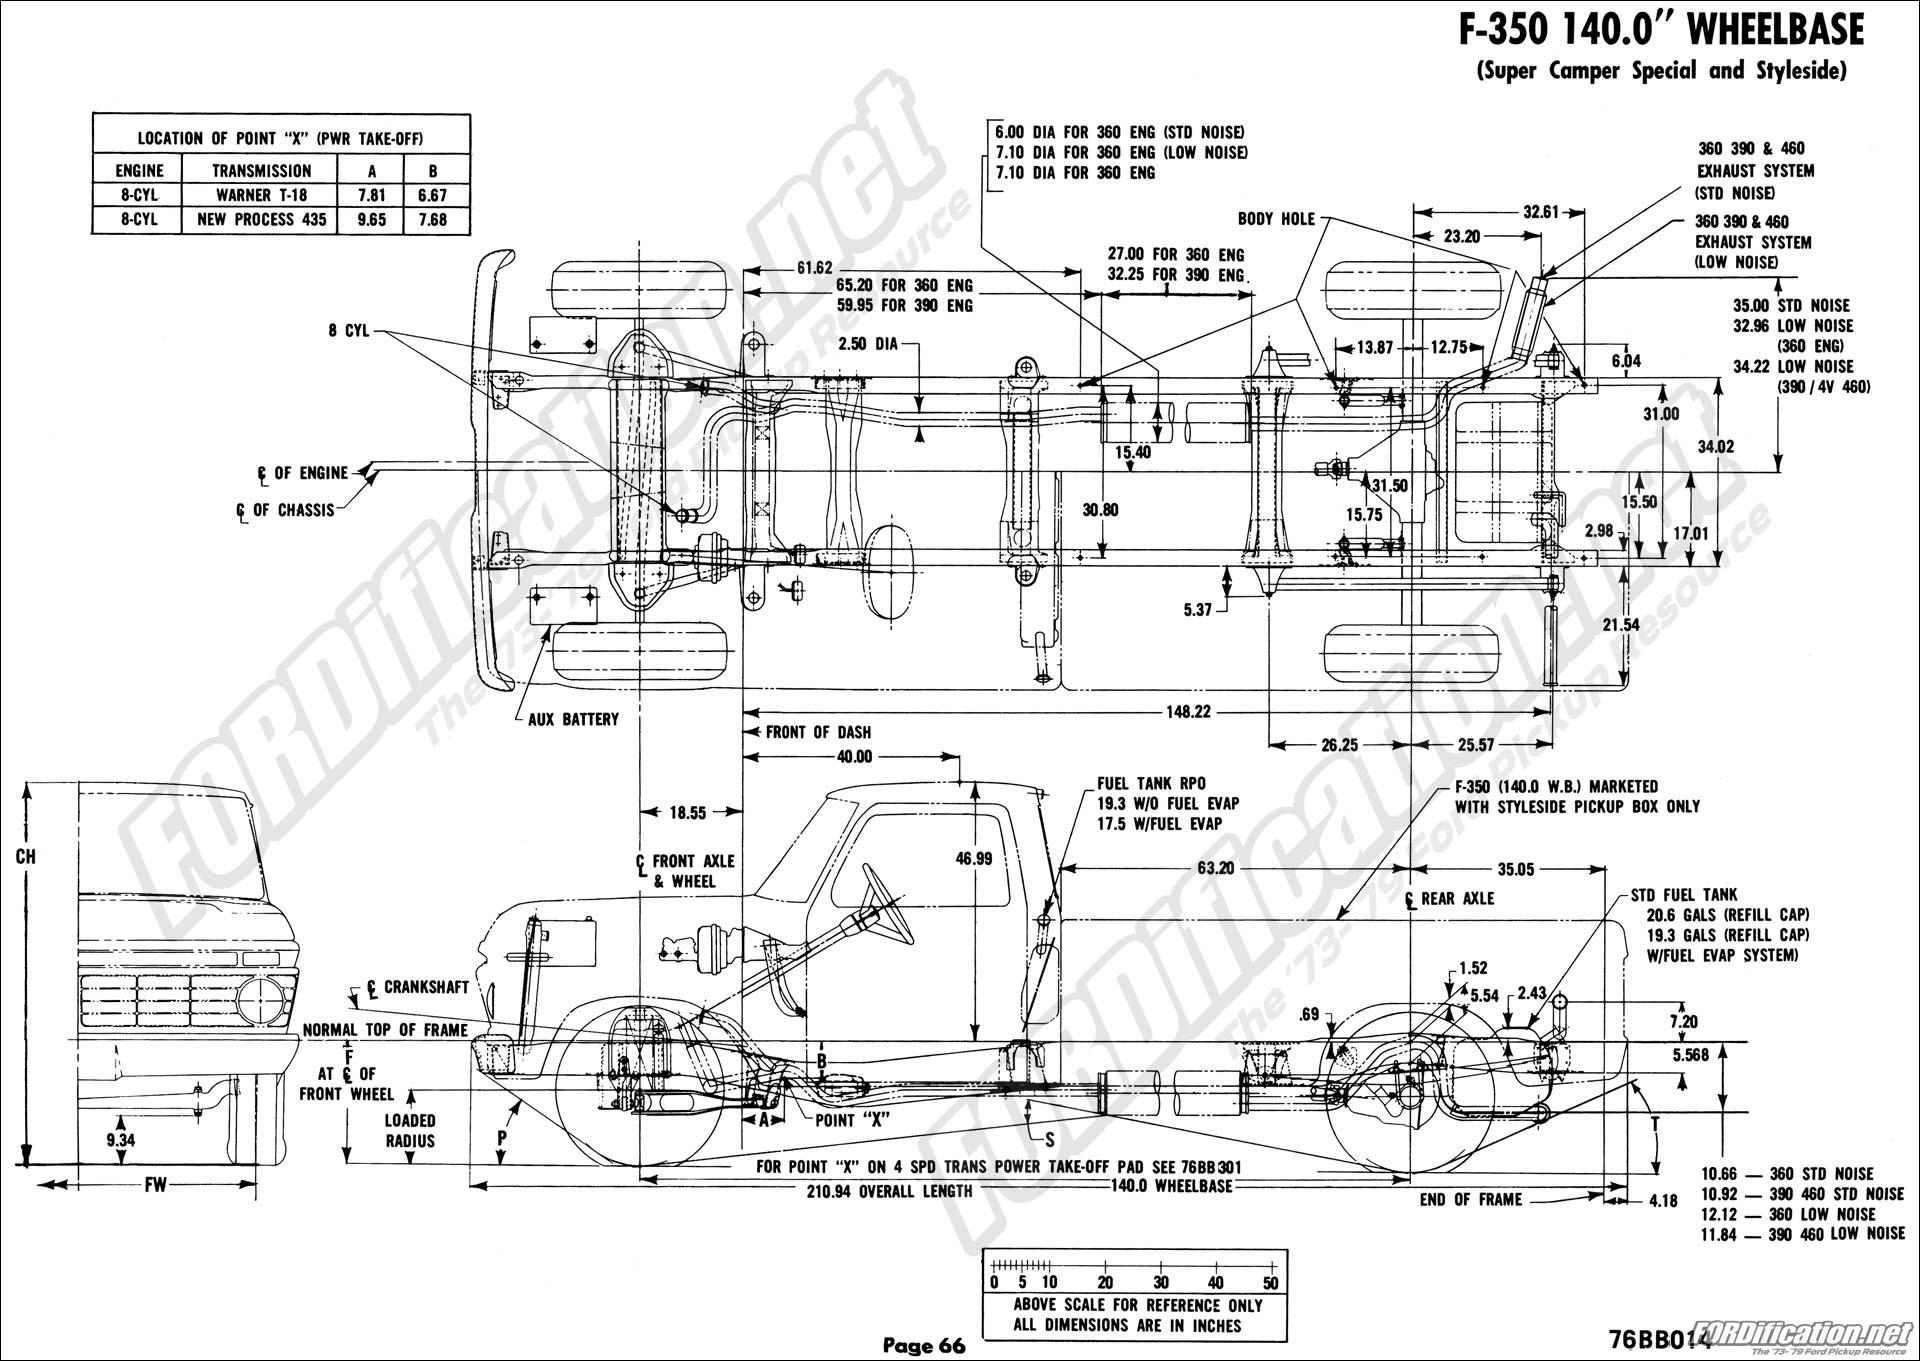 Ford F550 Frame Diagram Electrical Wiring Diagrams Dump Truck Width Lajulak Org 2006 F350 Schematics